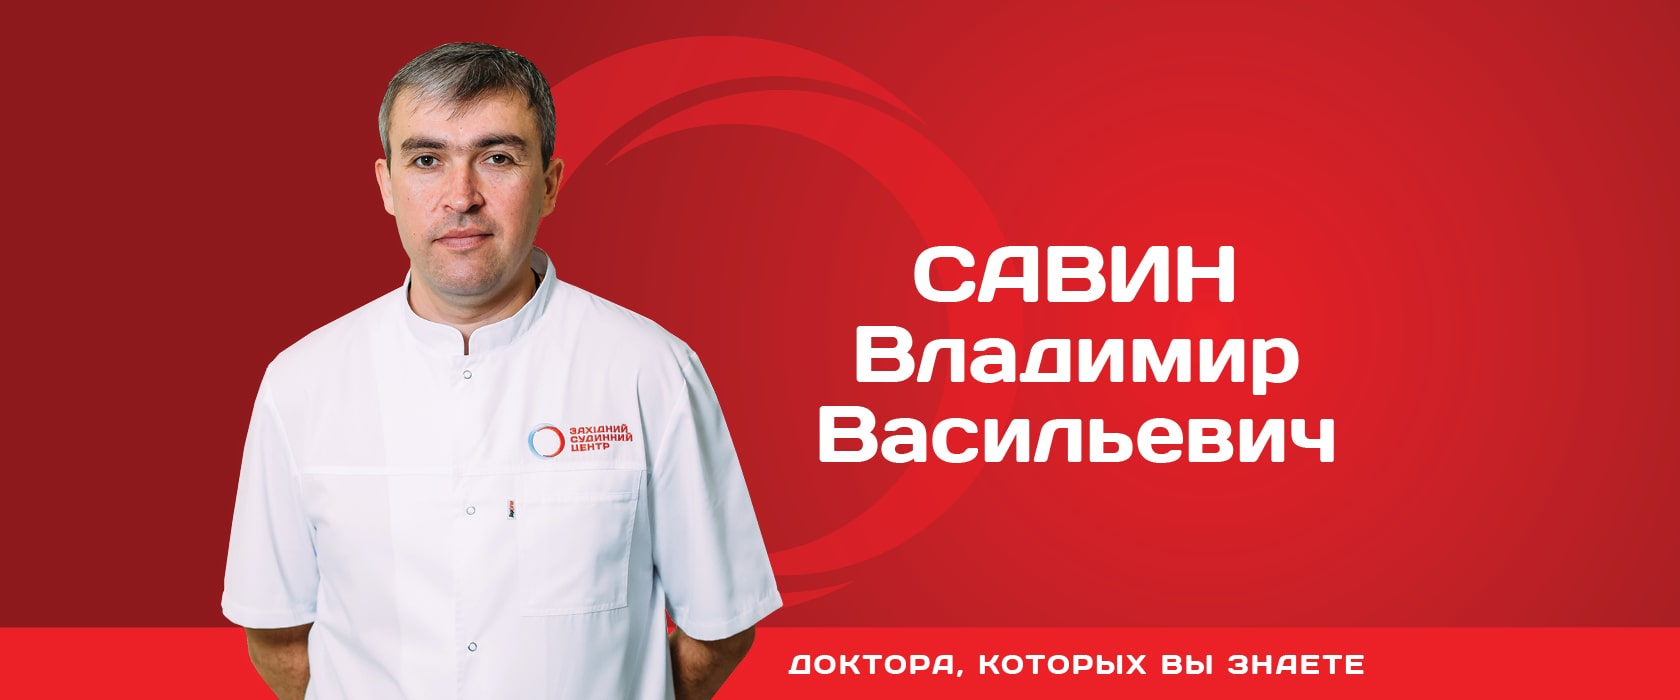 Савин Владимир Васильевич